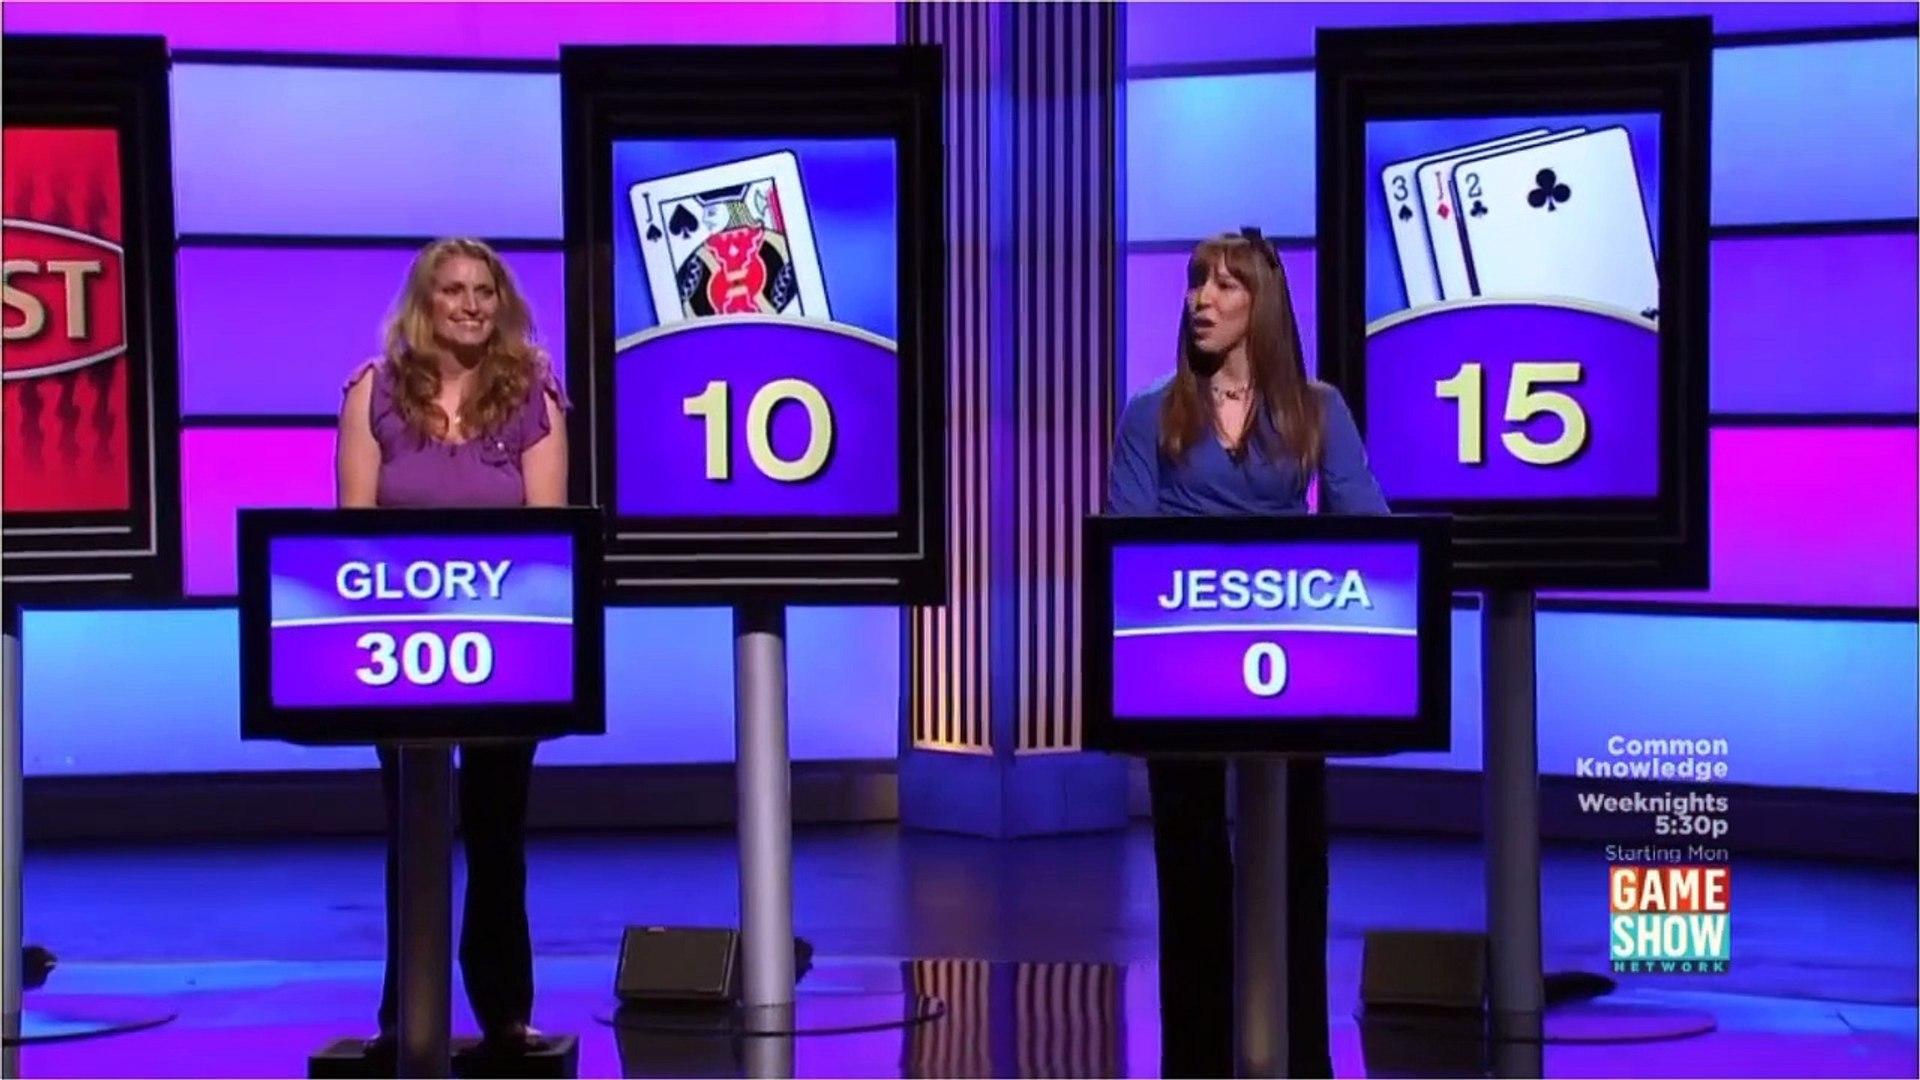 Catch 21- 09 January 2019 | Julian, Glory, Jessica | Catch 21 (01/09/2019) Episode 4207